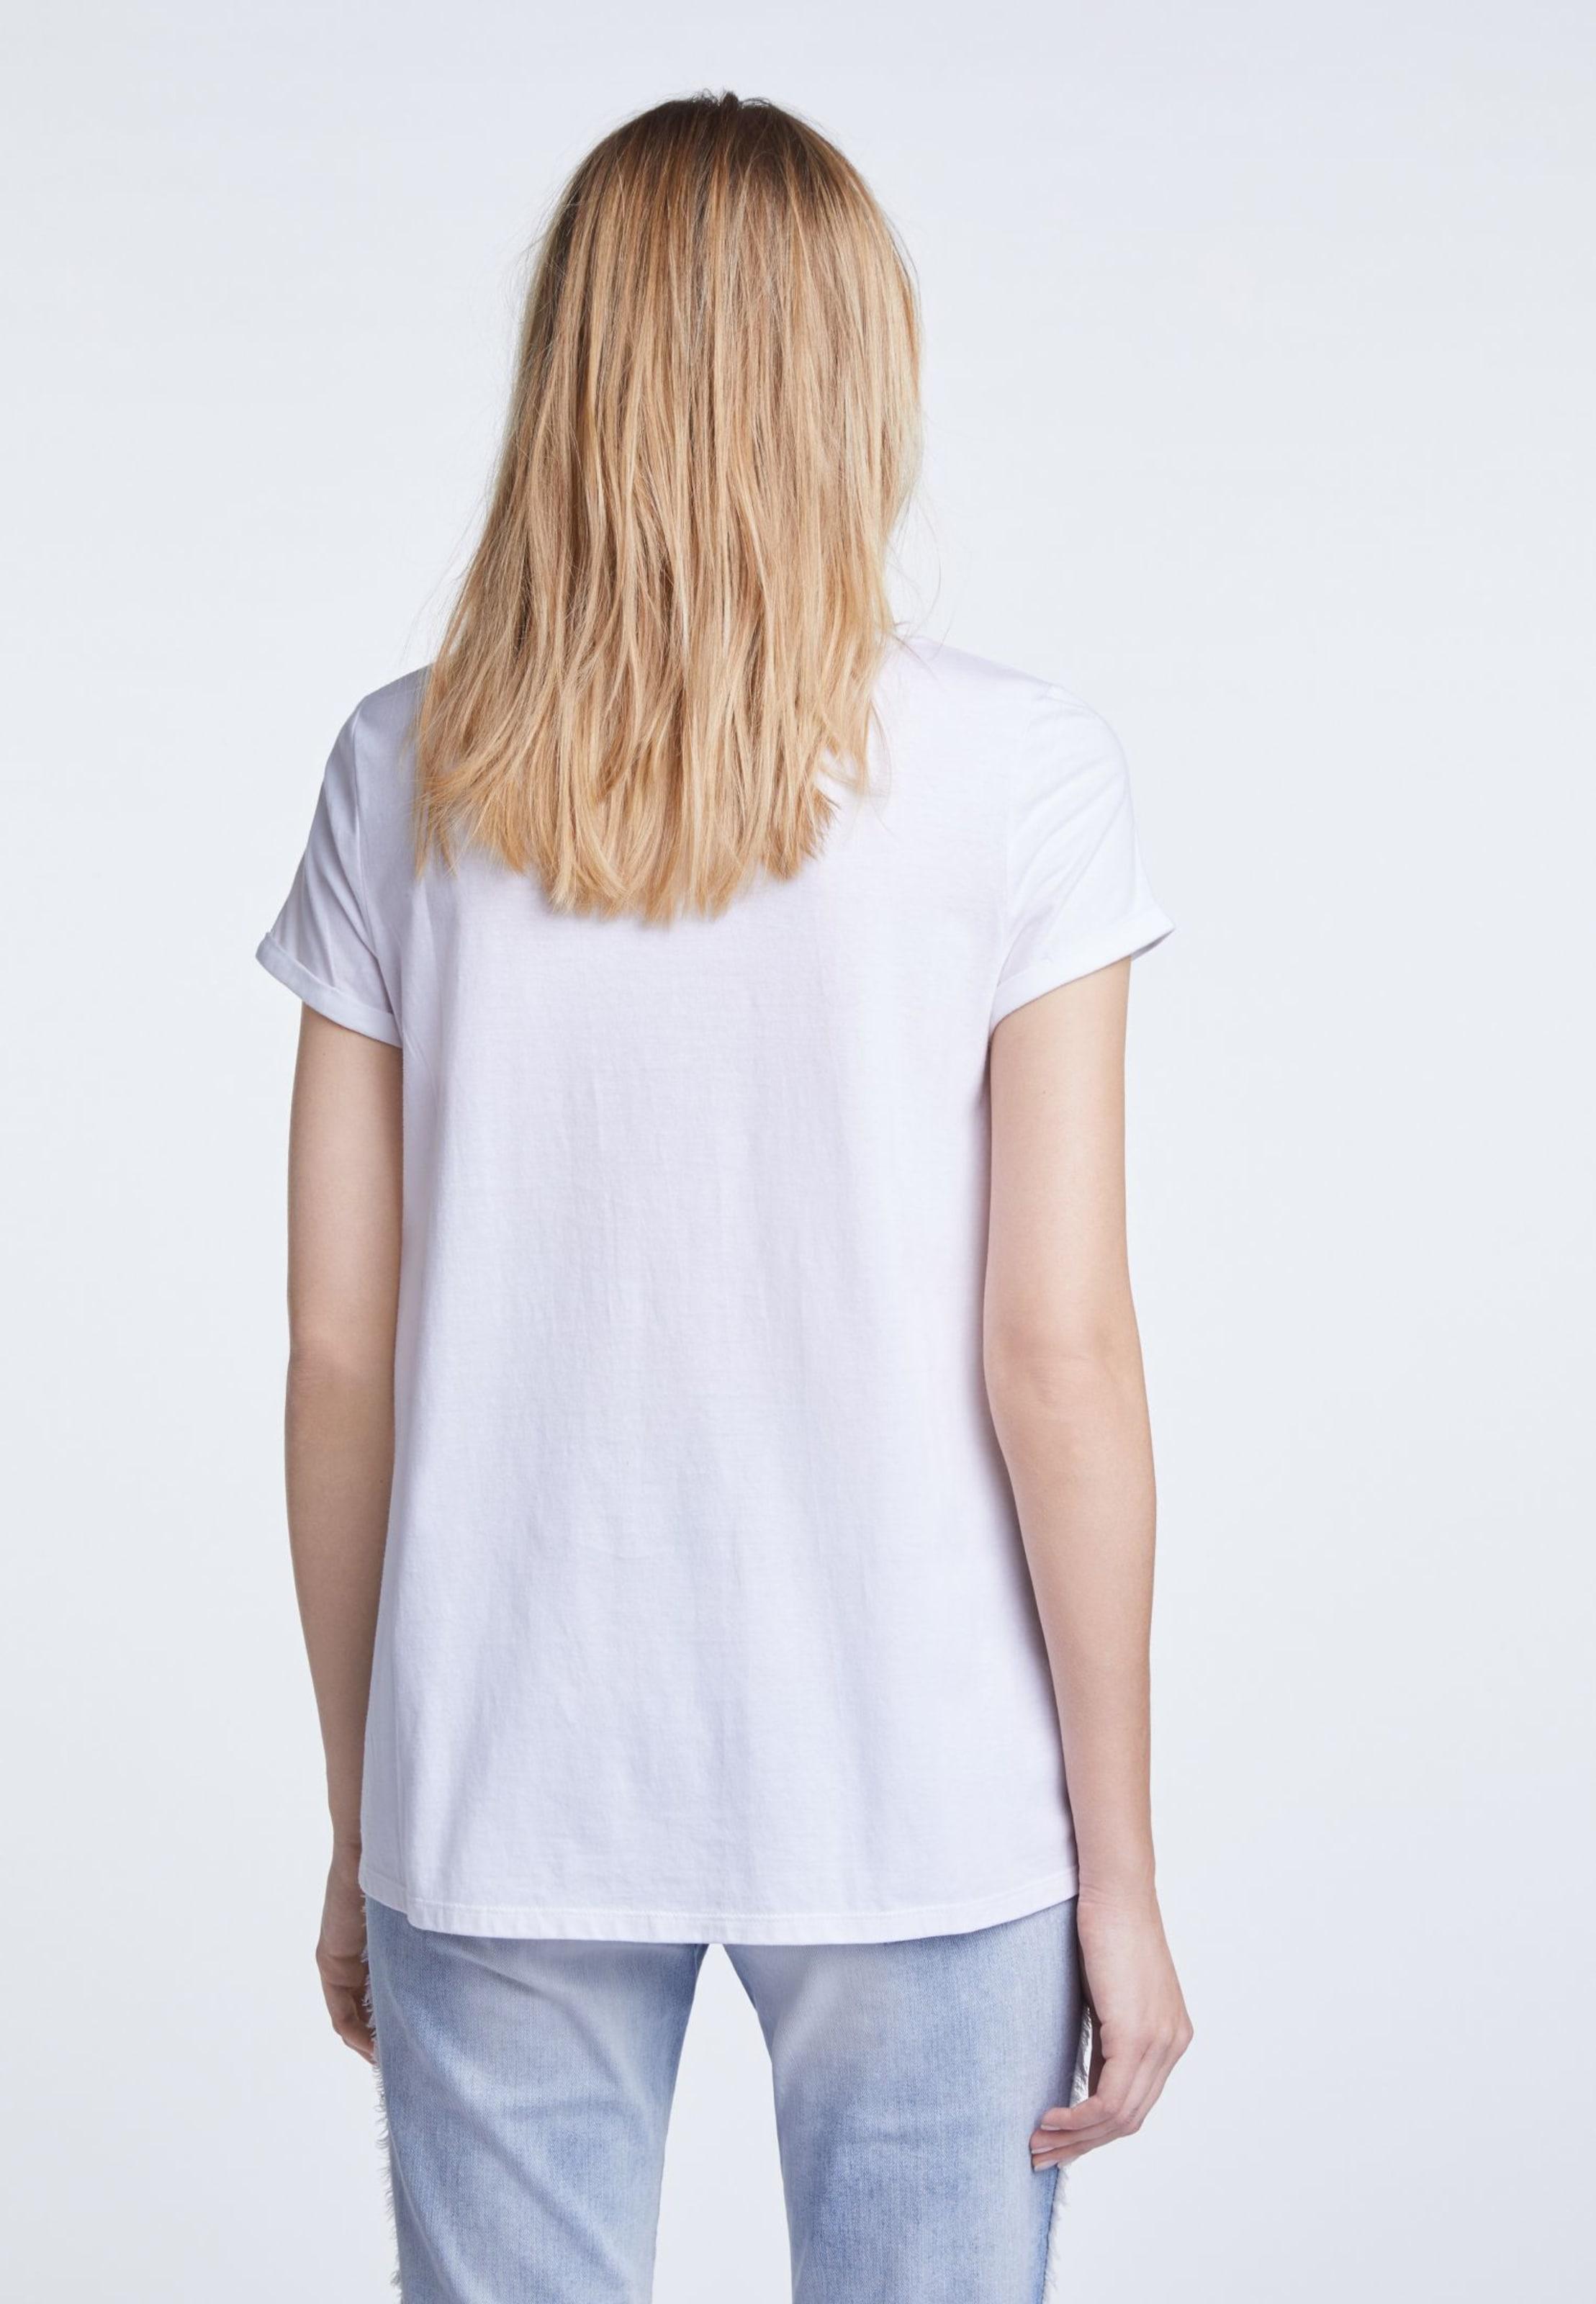 Oui In T MischfarbenWeiß shirt m0OynvNw8